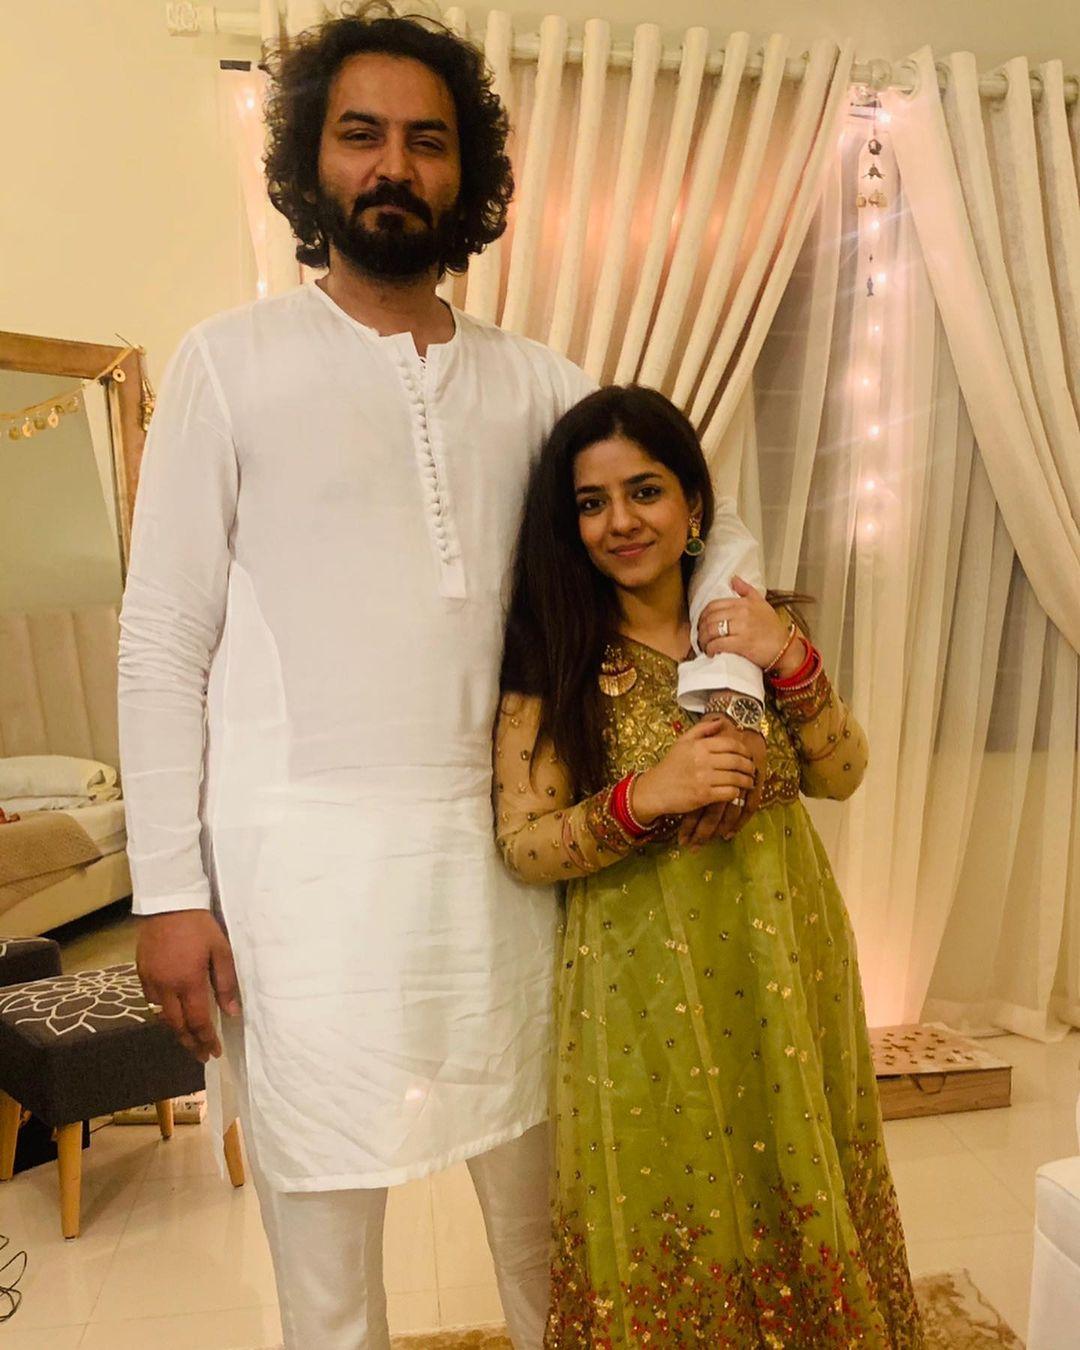 Newly Wed Couple Sadia Jabbar and Qasim Ali Mureed with Friends